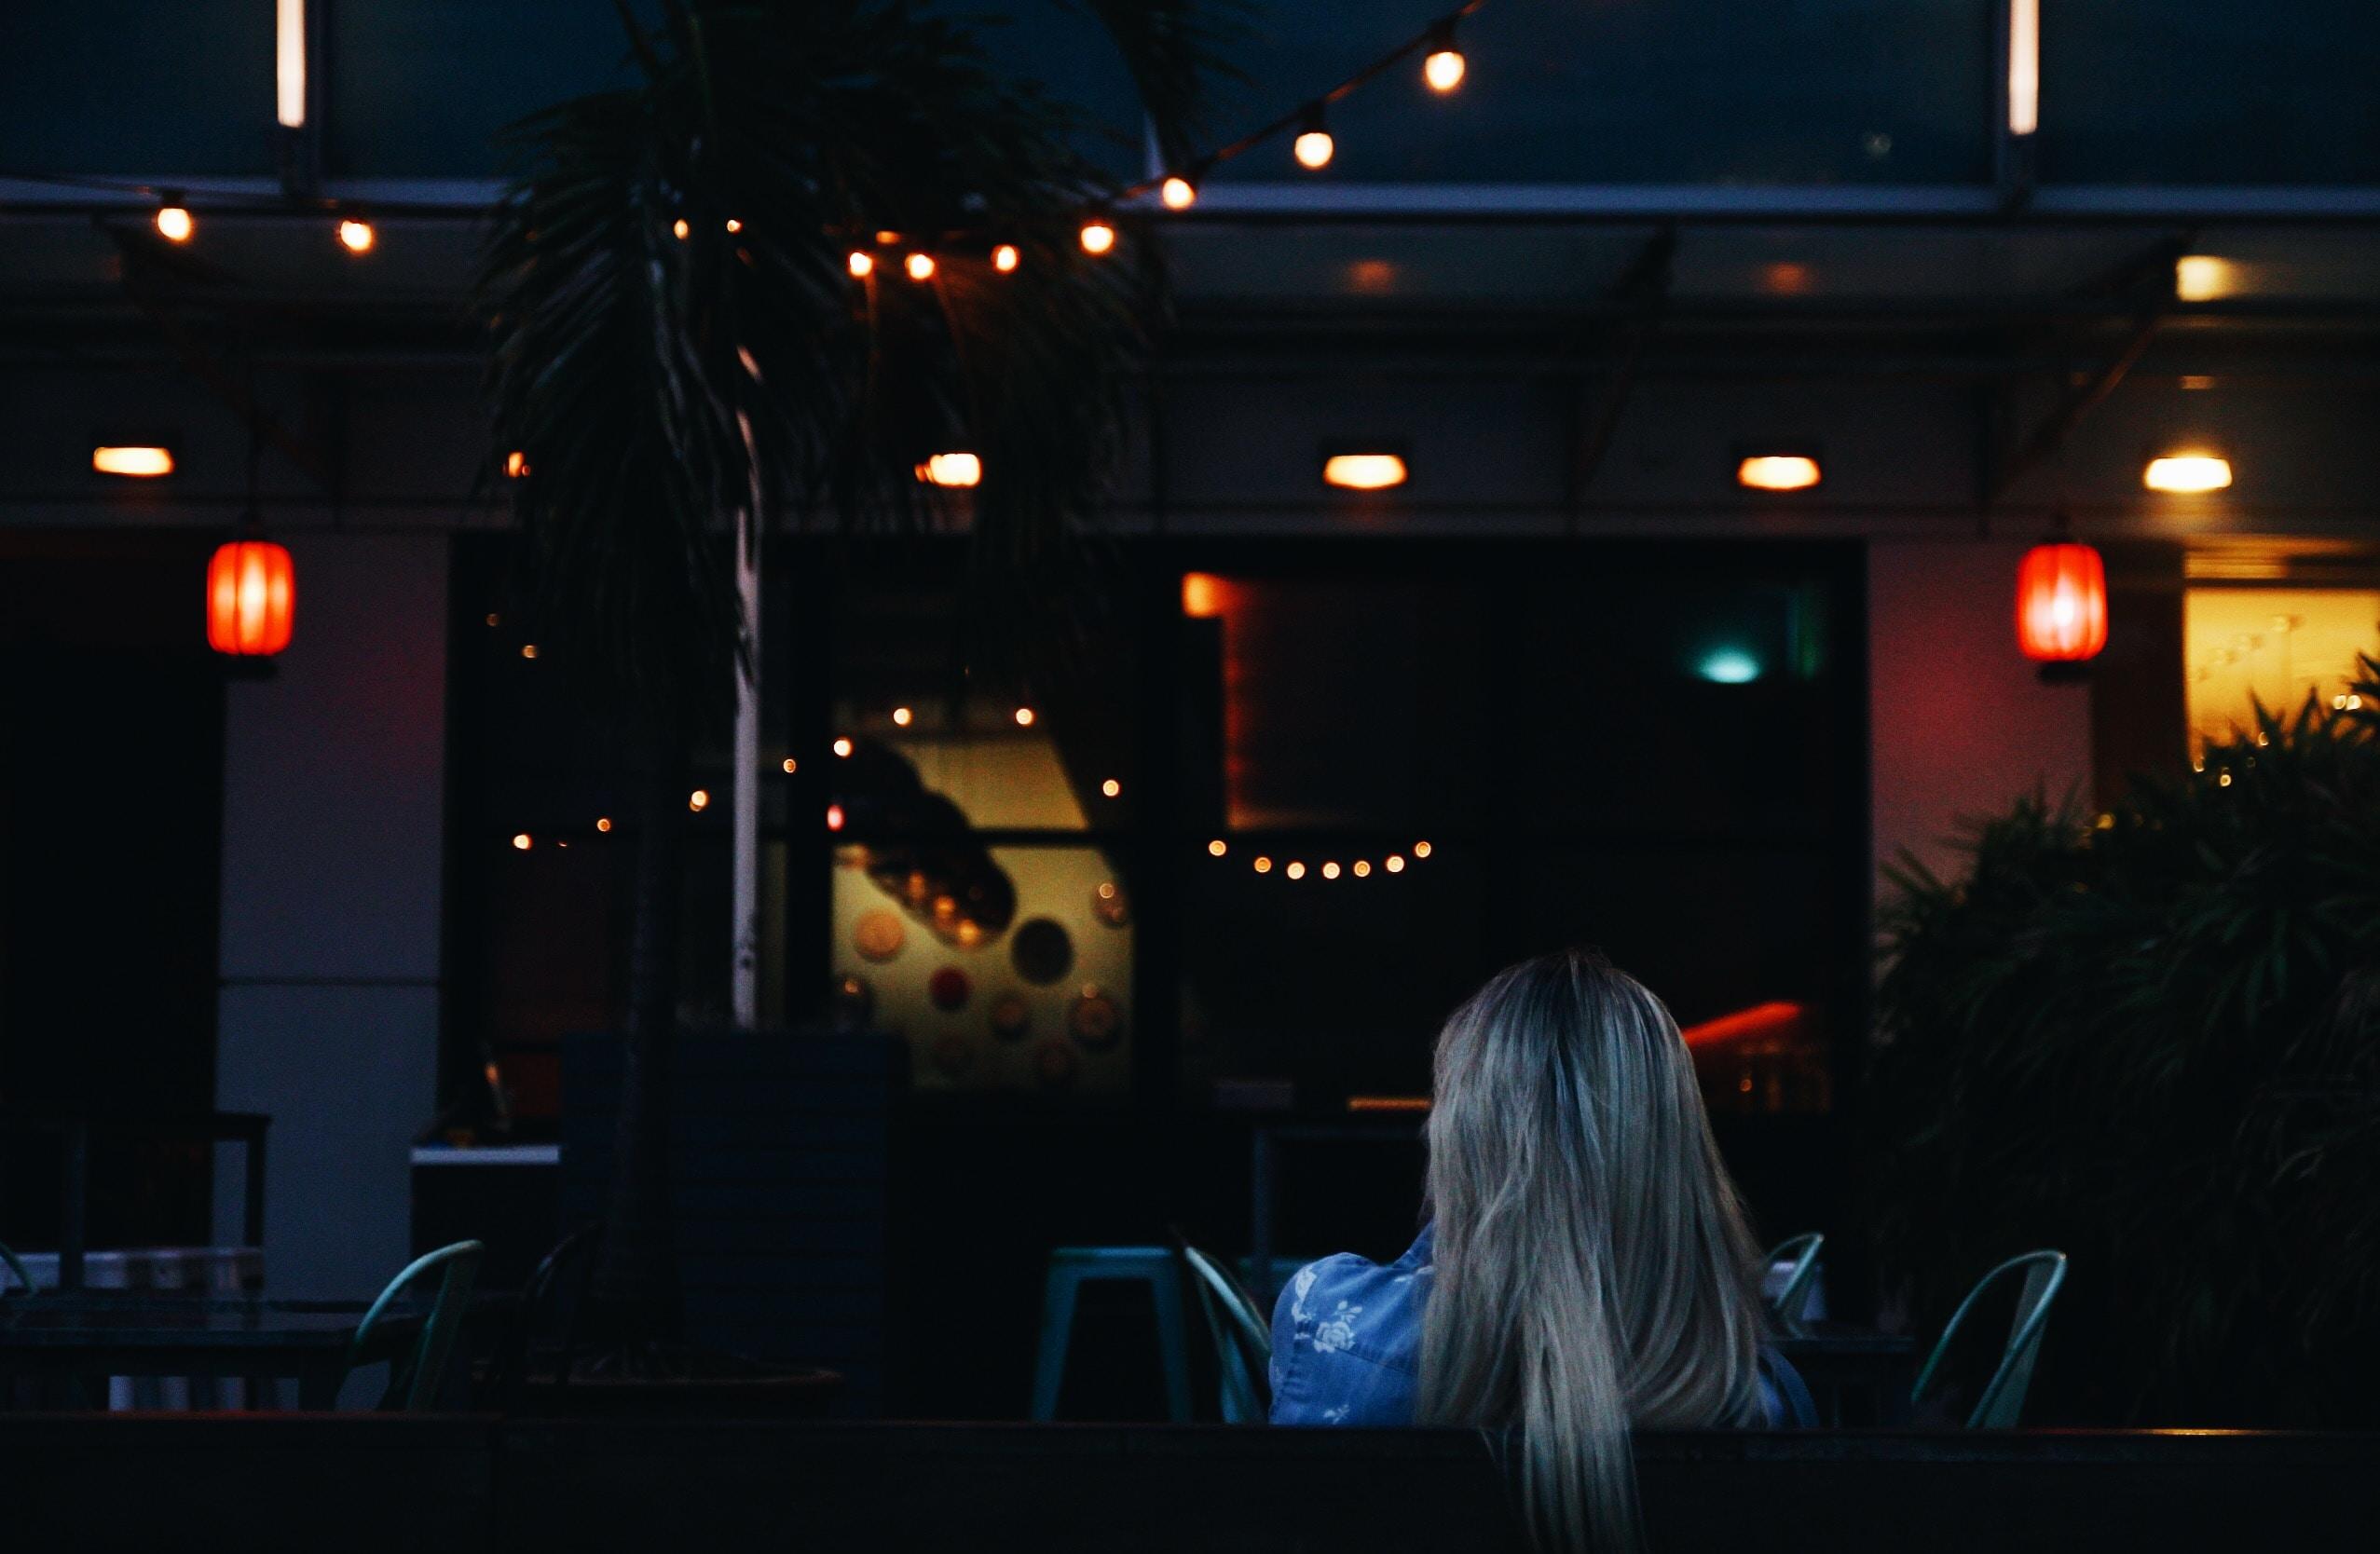 woman sitting while facing towards bar